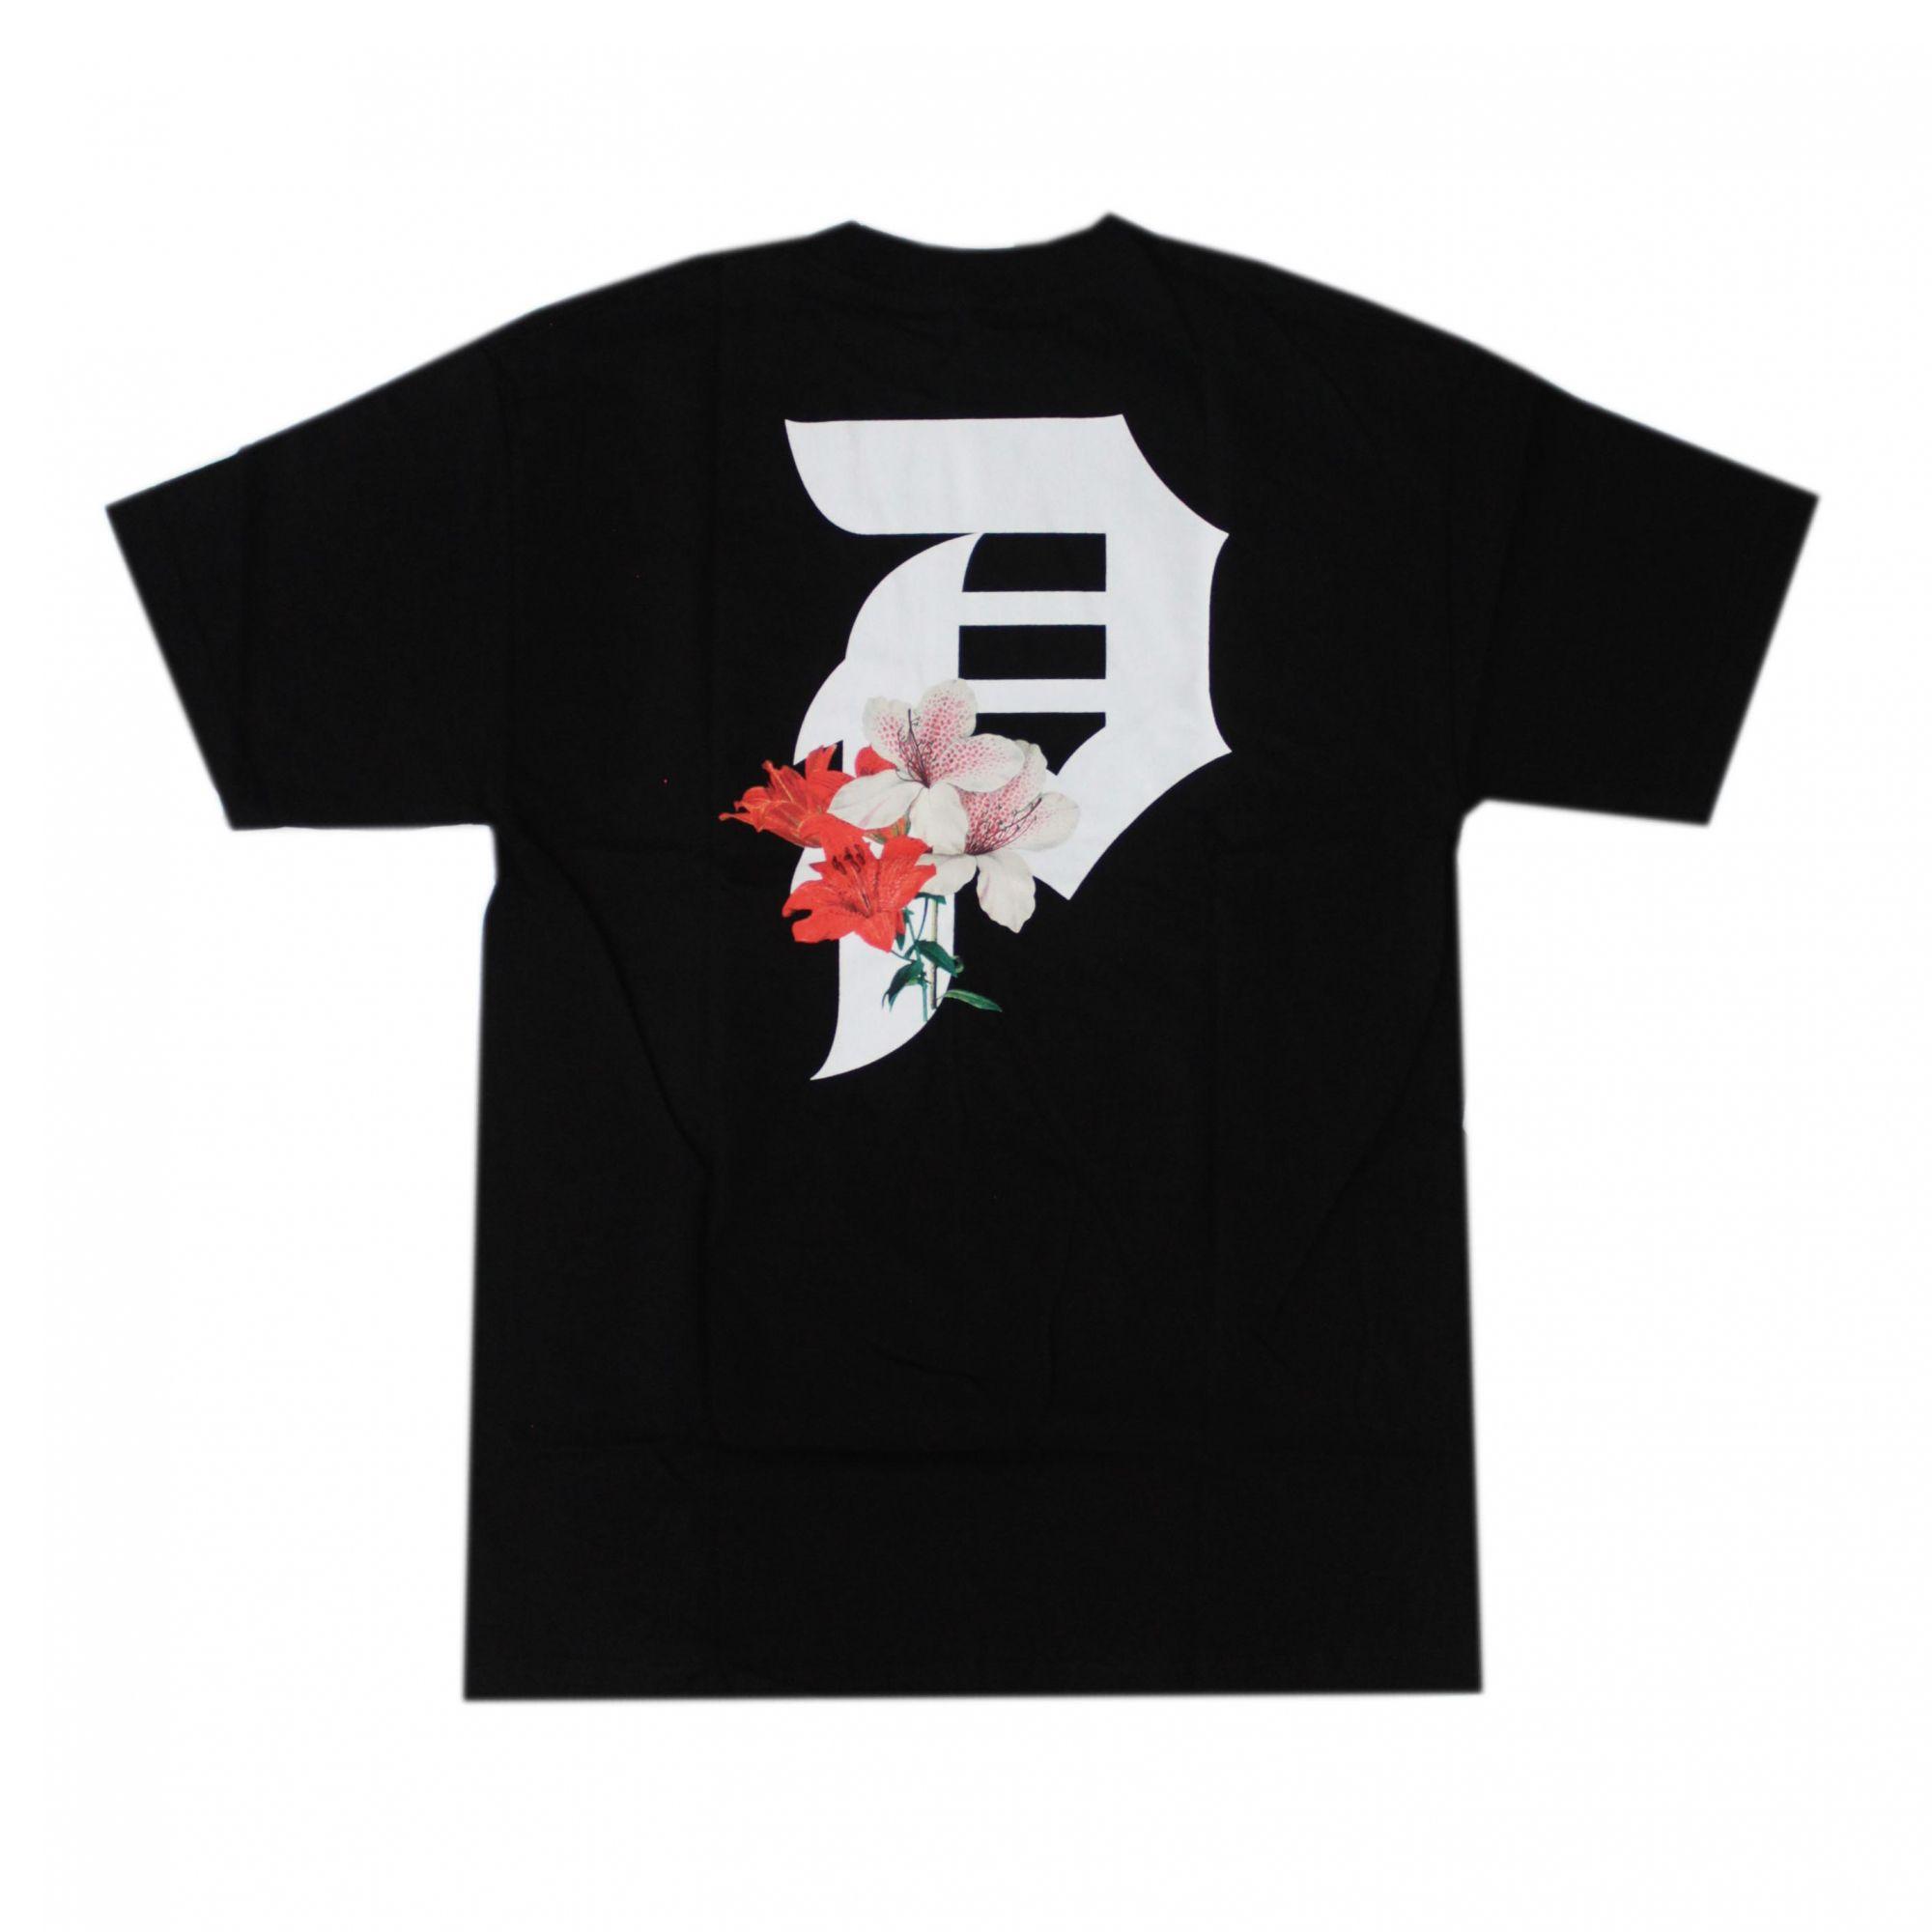 Camiseta Primitive Dirty P Casual Tee Preto P Lily Tee - Preto (Importado)